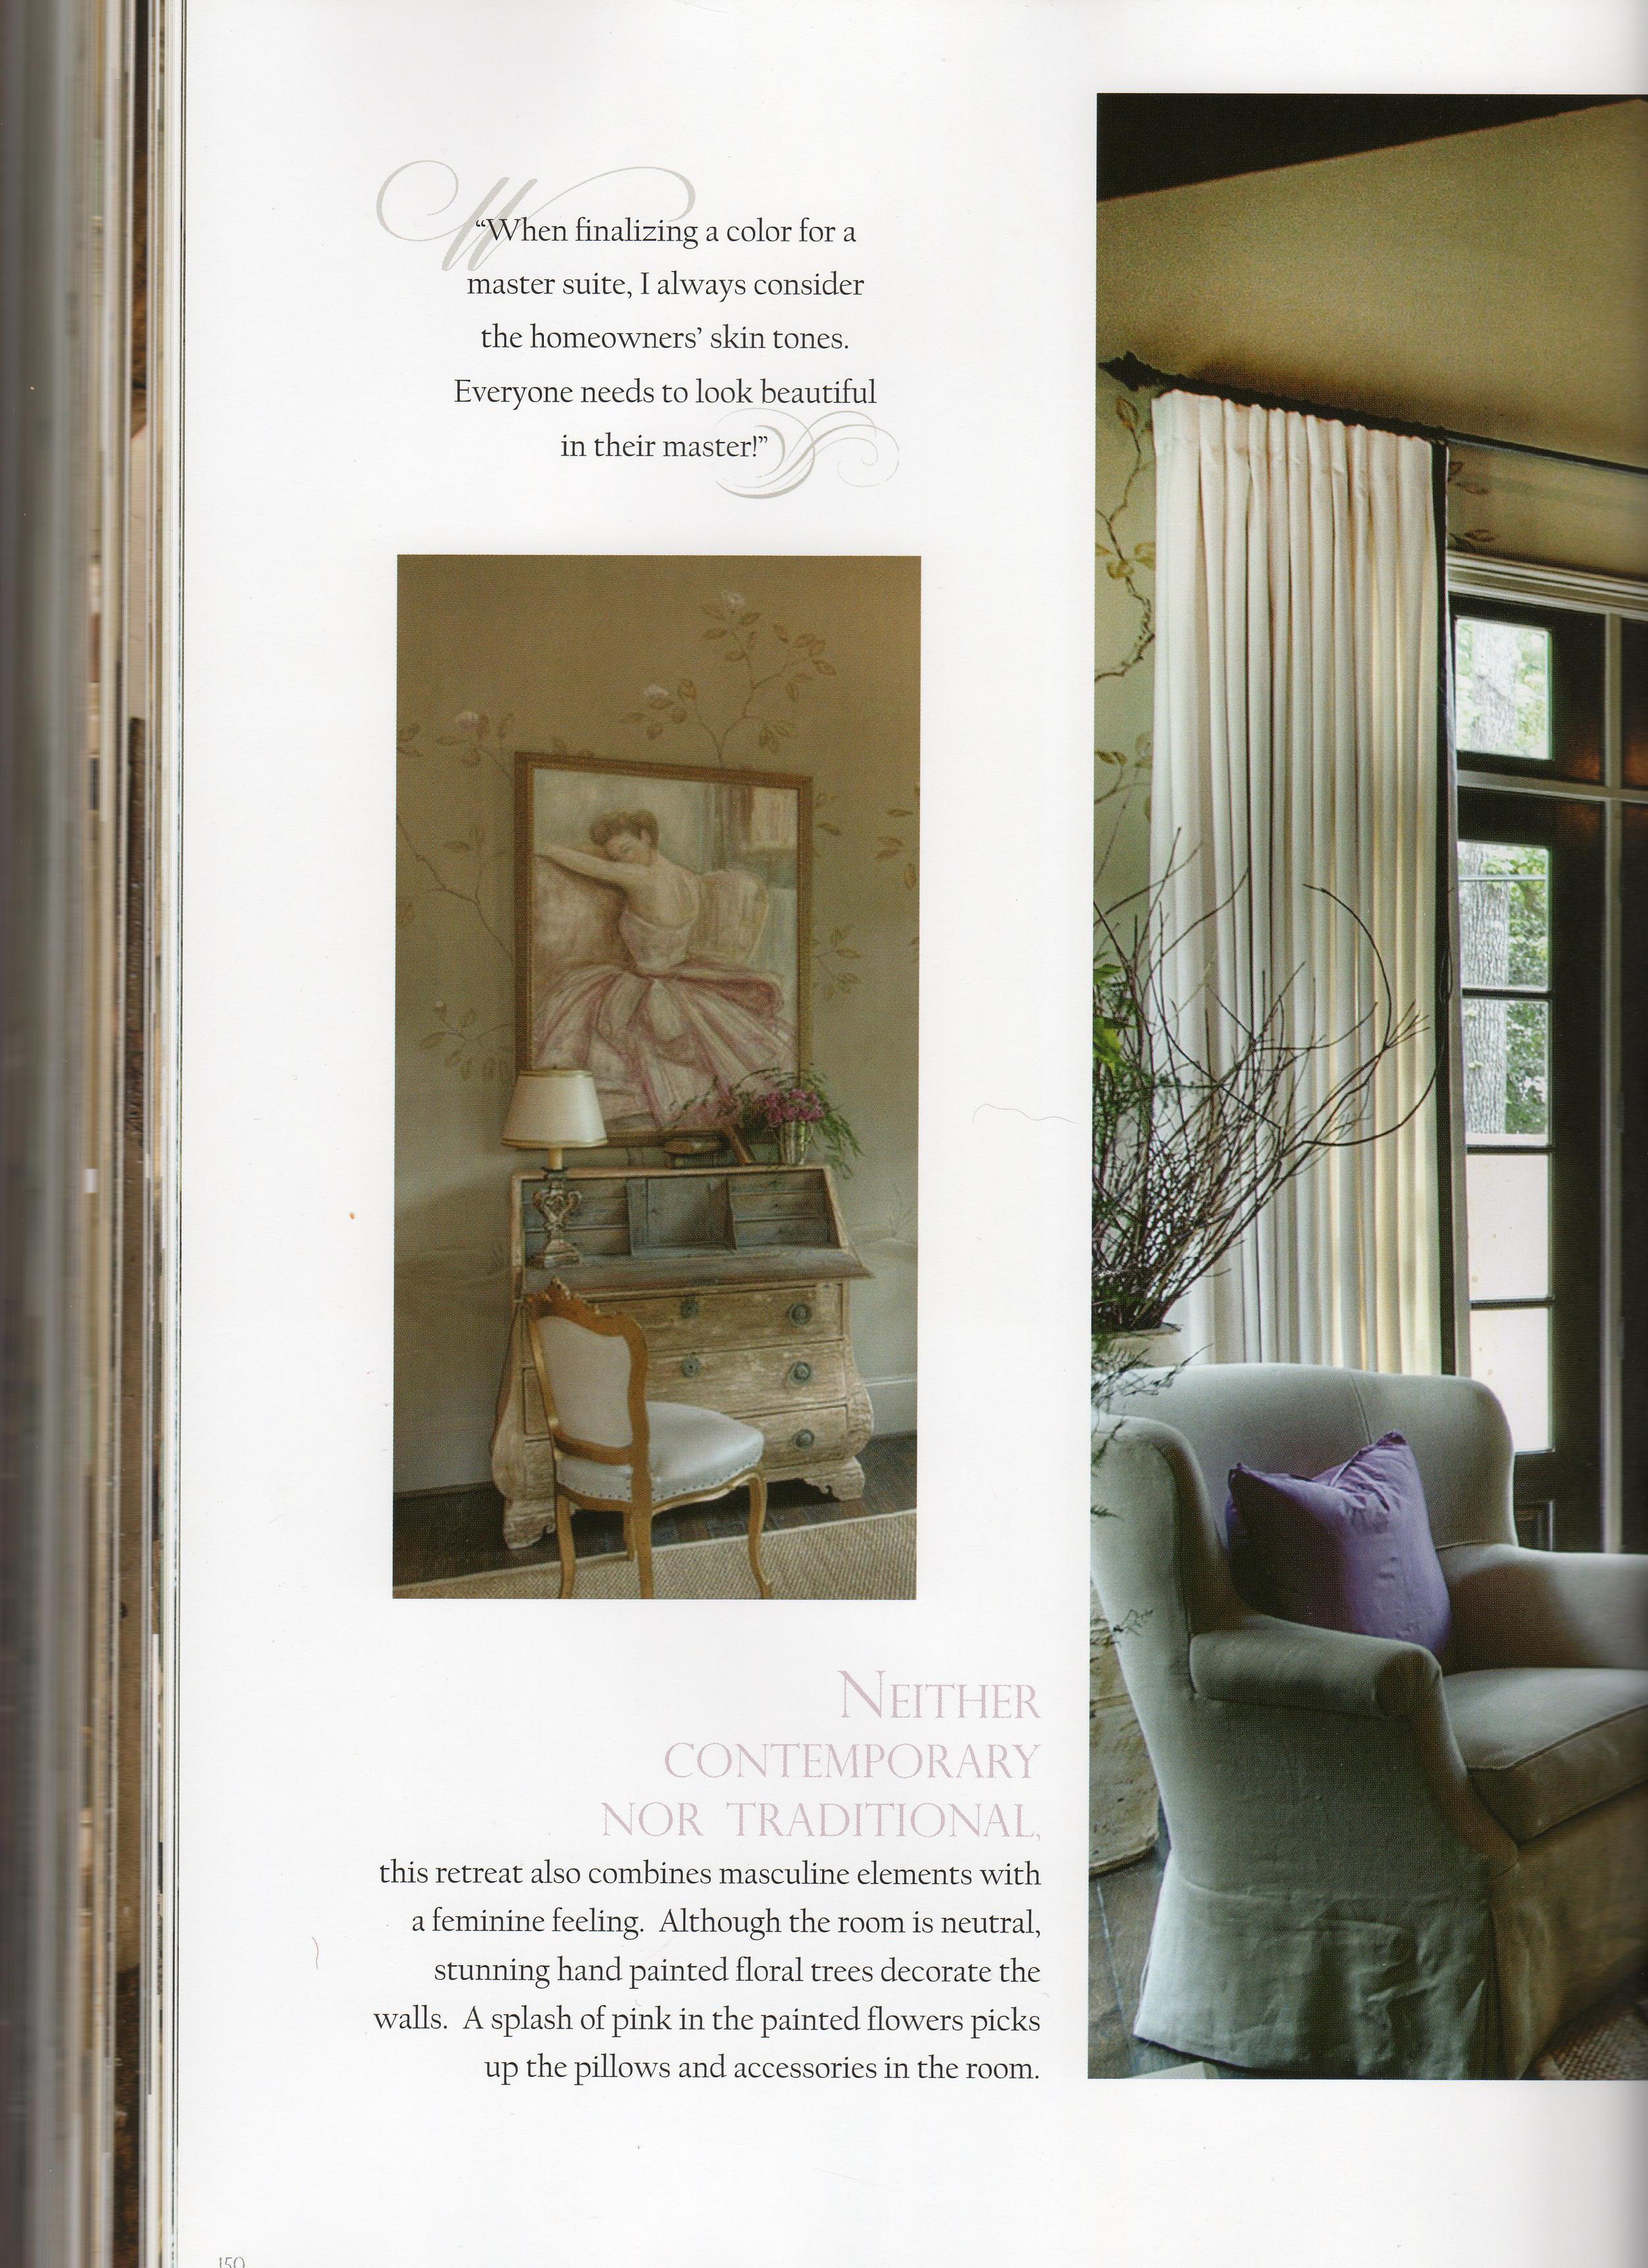 Segreto:  Secrets to Finishing Beautiful Interiors   Leslie Sinclair  2011